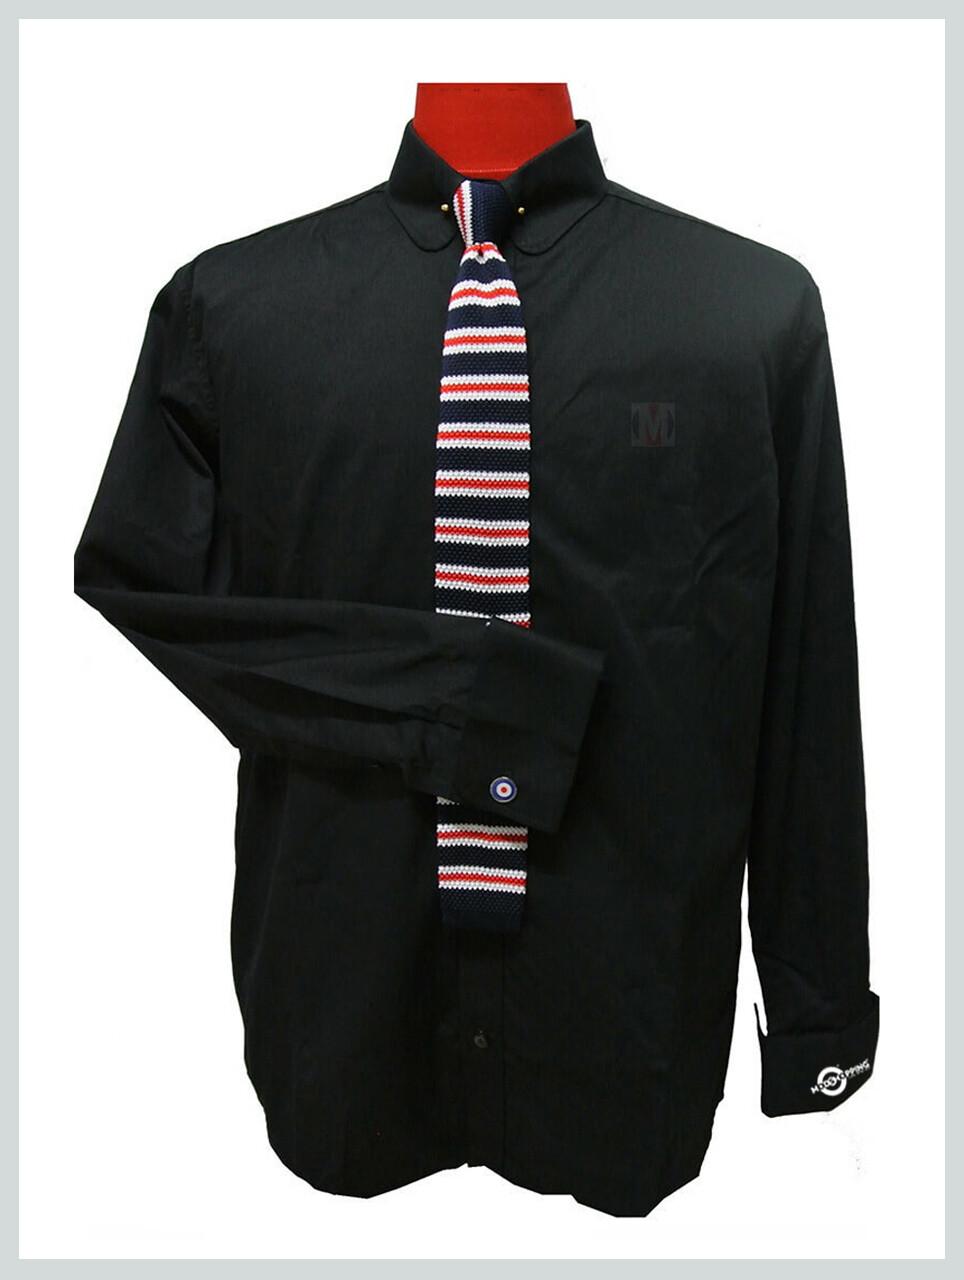 Black Mod Shirt| 60s Vintage Mod Style Penny Collar Shirt Uk